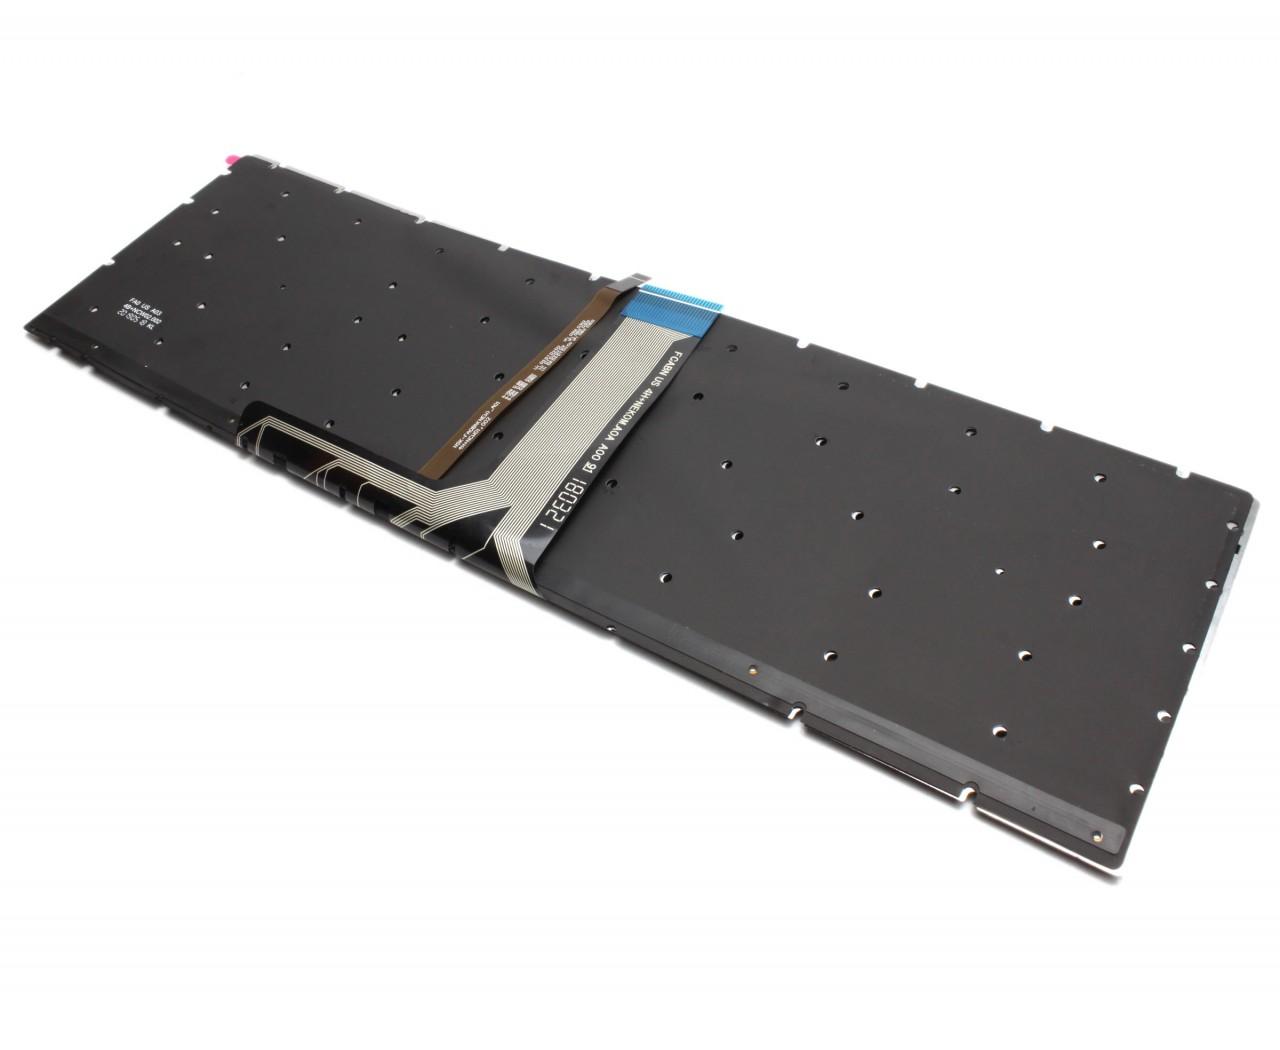 Tastatura MSI GE62 2QF Apache Pro iluminata layout US fara rama enter mic imagine powerlaptop.ro 2021